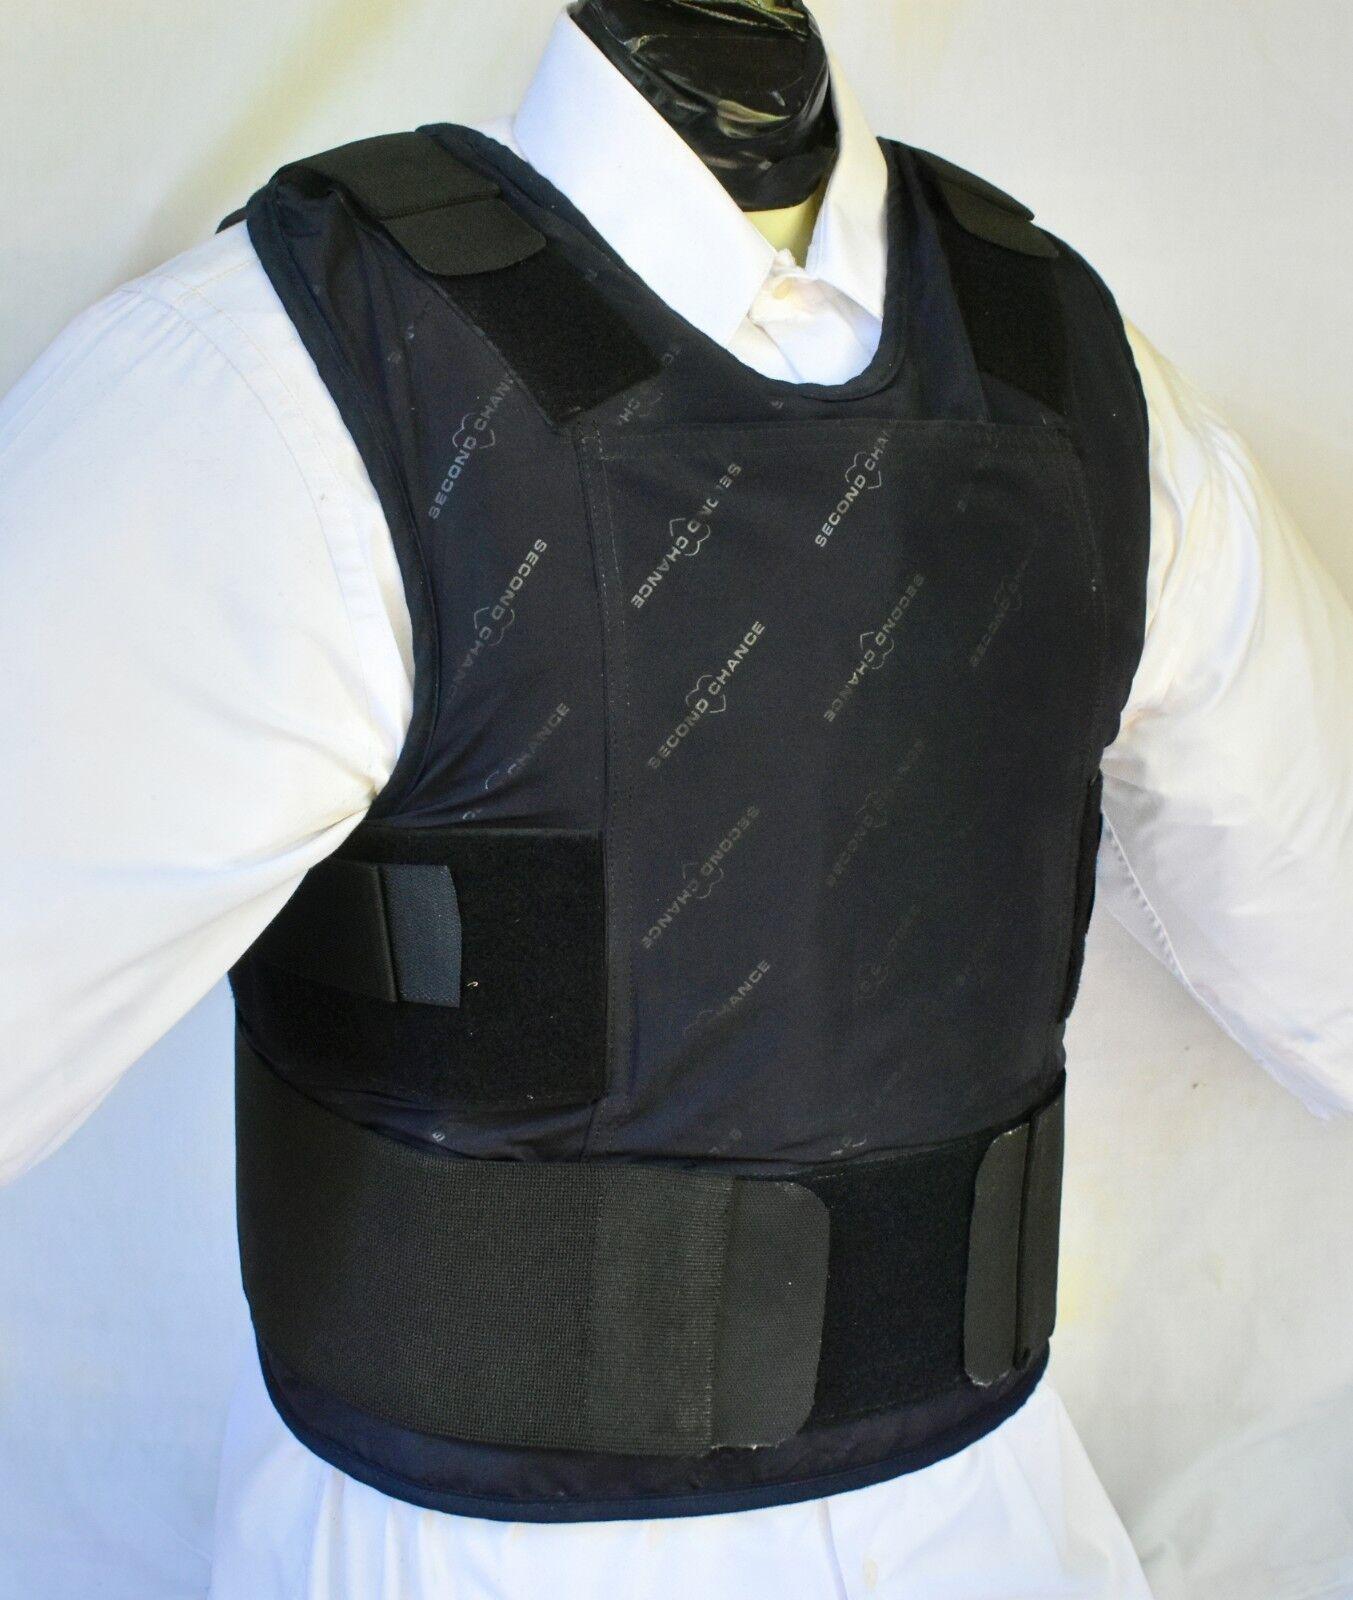 XXL IIIA Lo Vis   Concealable Body Armor Carrier BulletProof Vest with Inserts